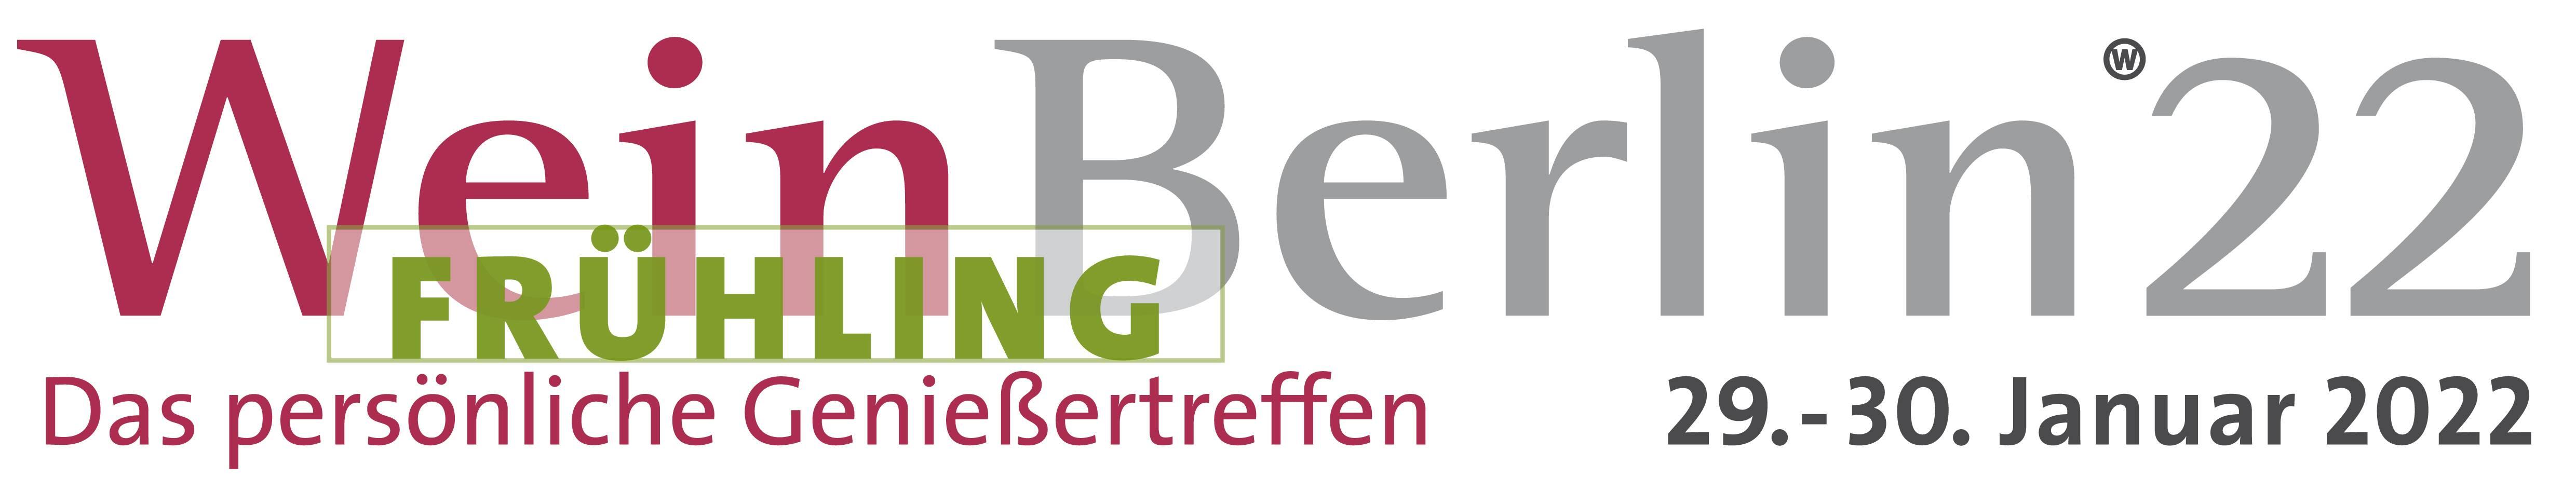 WeinBerlin Frühling Logo